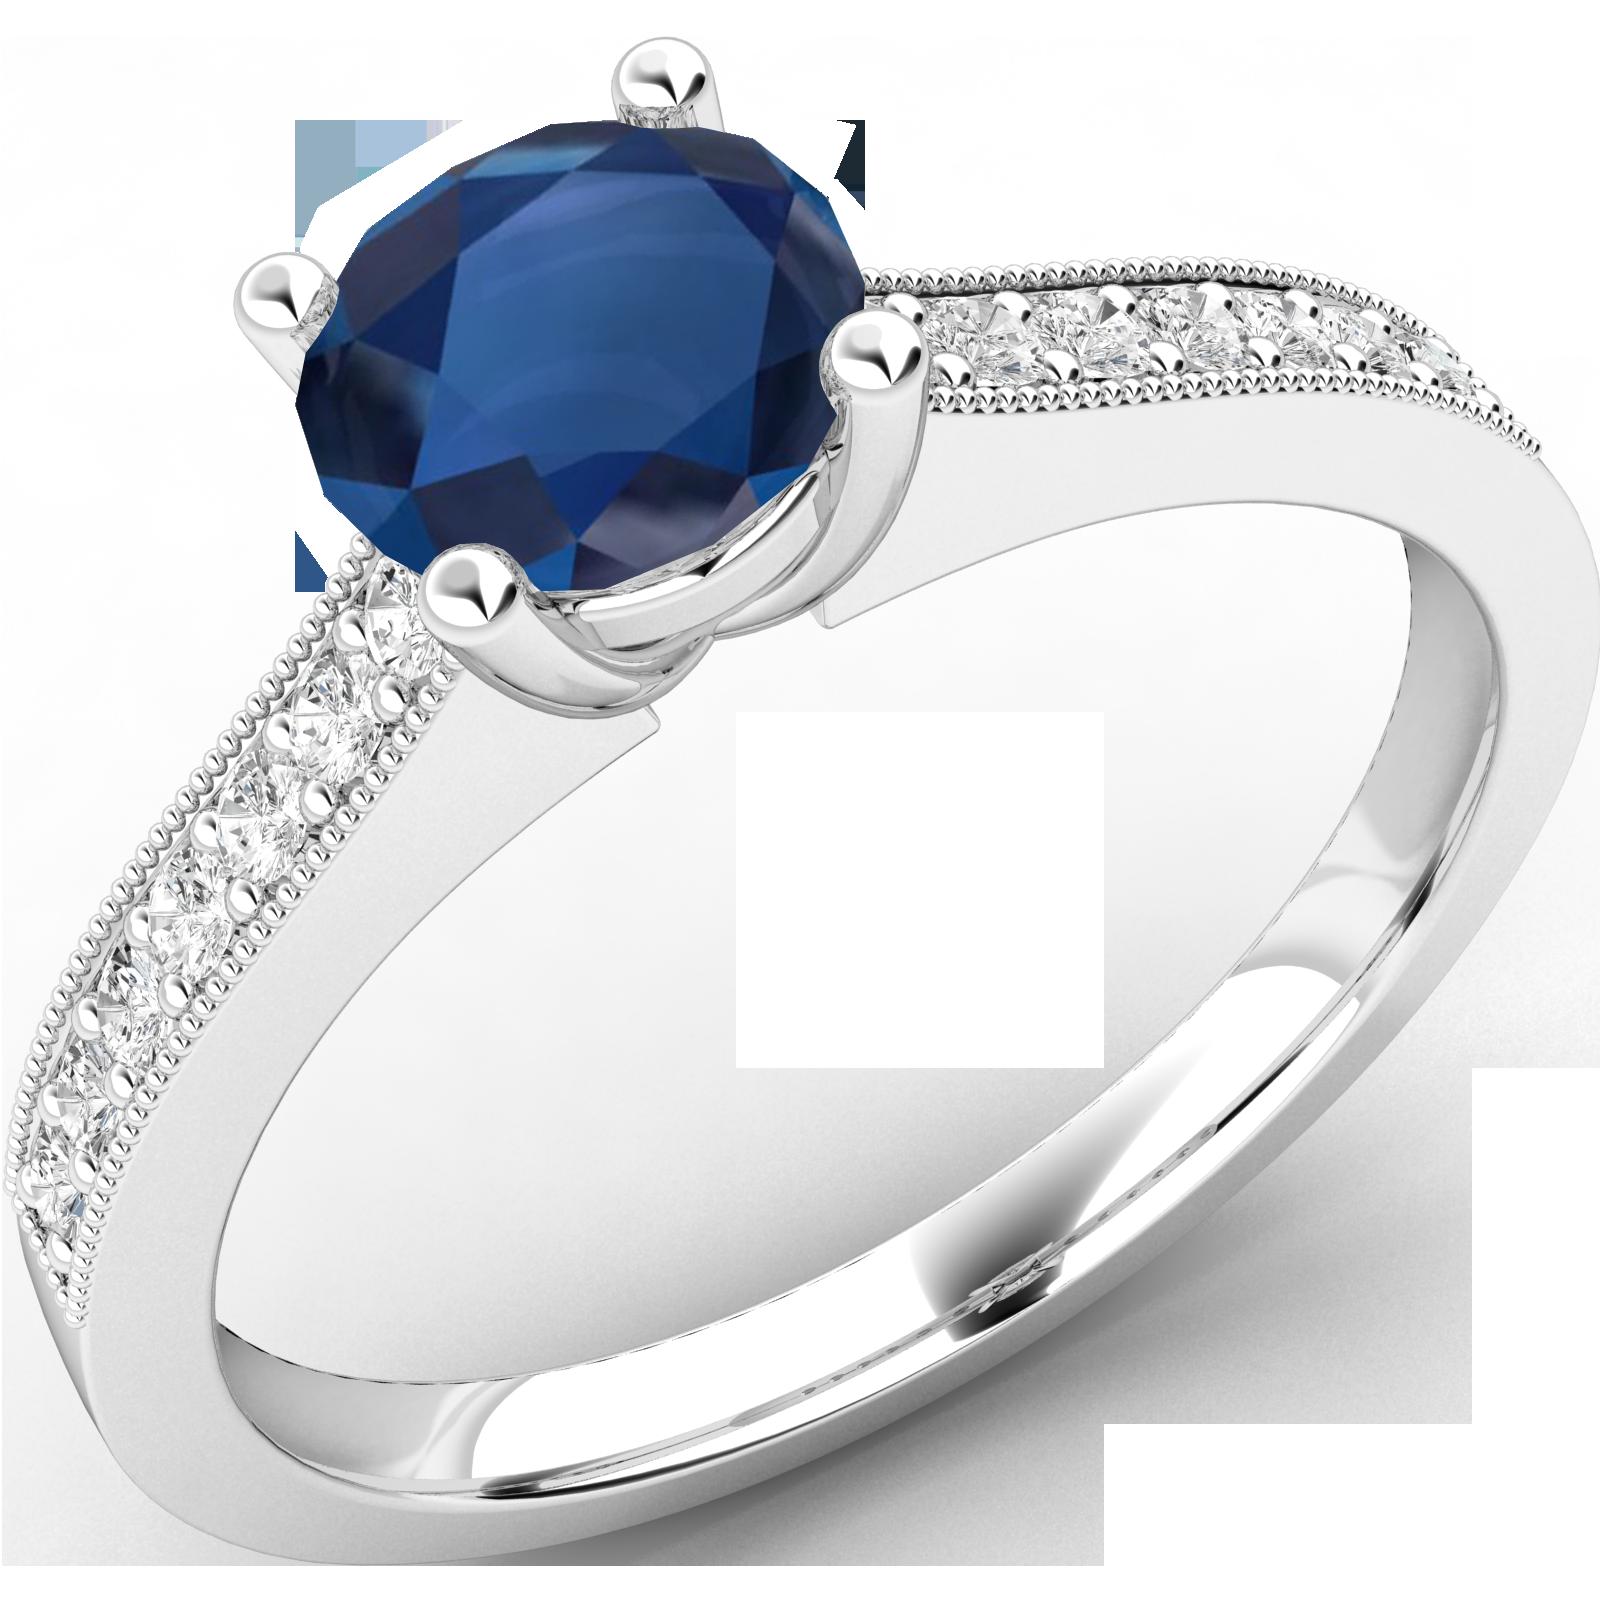 RDS497W-Inel cu Safir si cu Diamante Mici pe Lateral Dama Aur Alb 18kt Setat cu un Safir Central Rotund Briliant si Diamante Rotund Briliant pe Lateral-img1